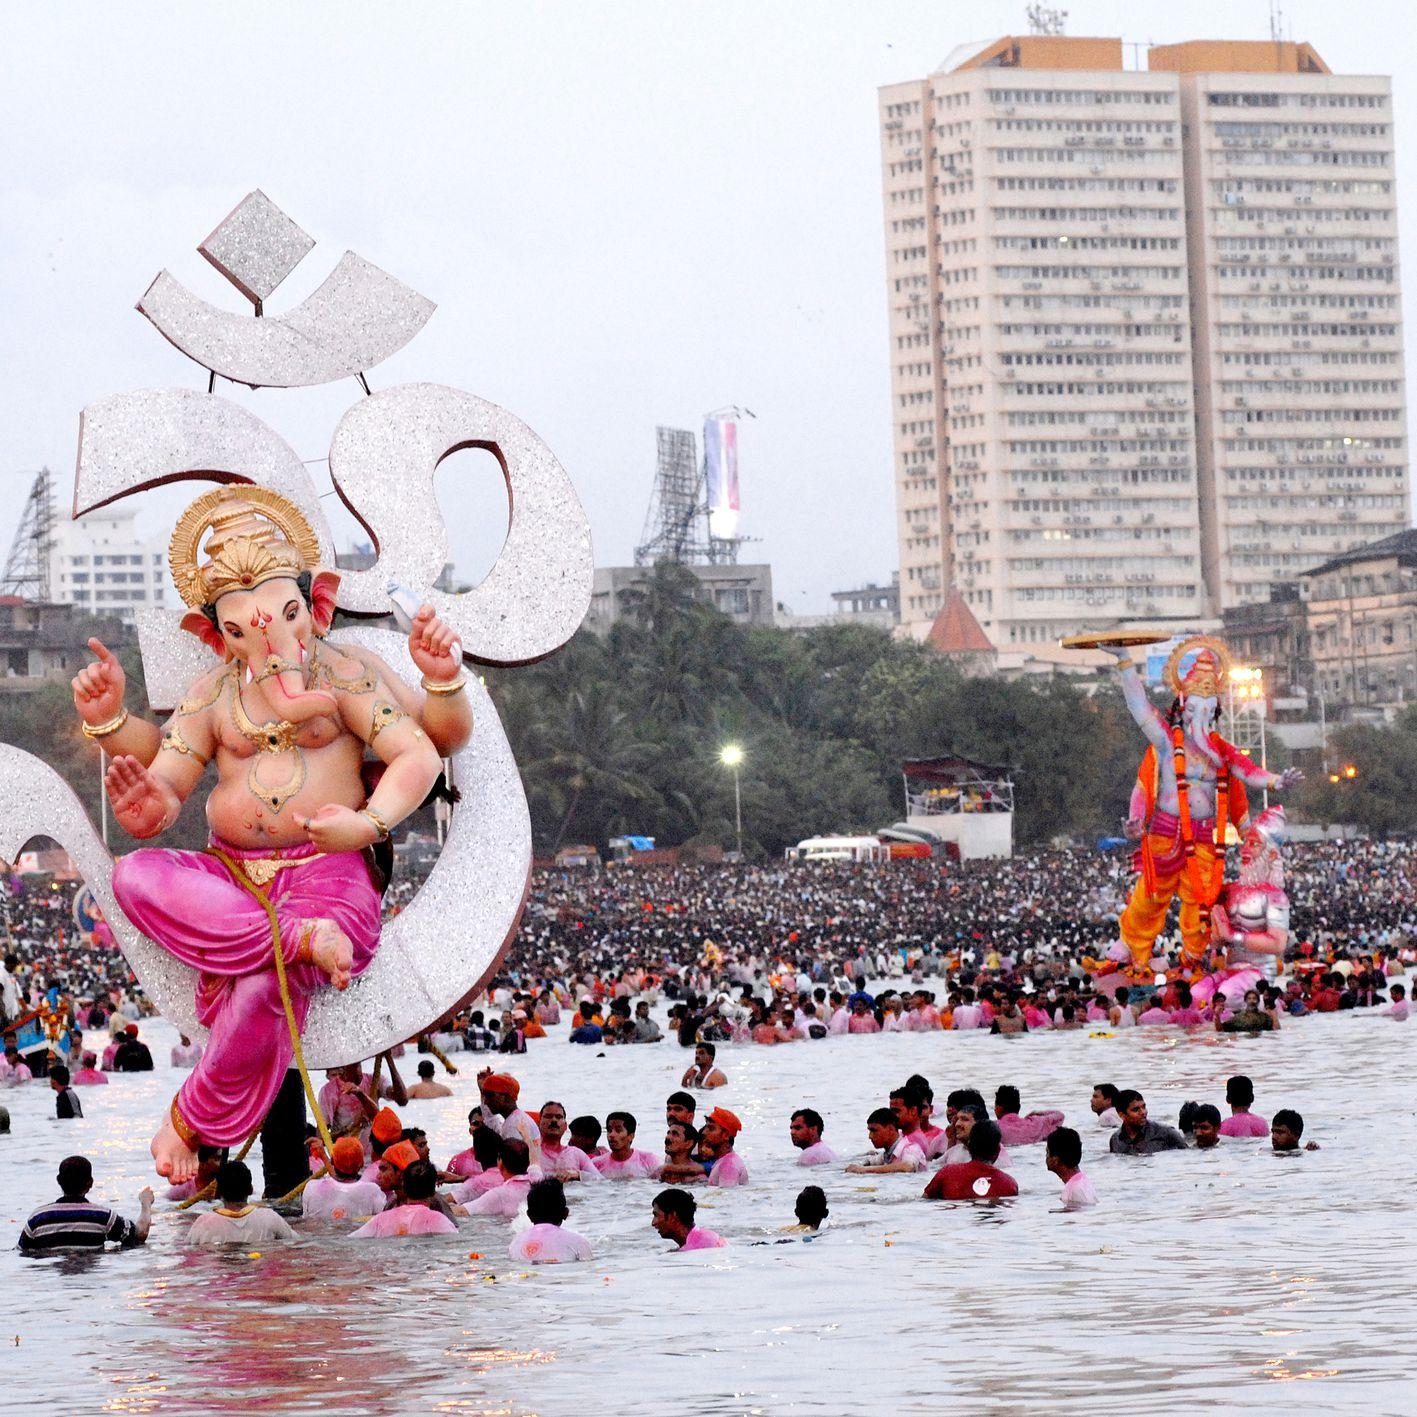 Guide to 2019 Mumbai Ganesh Visarjan (Immersion)